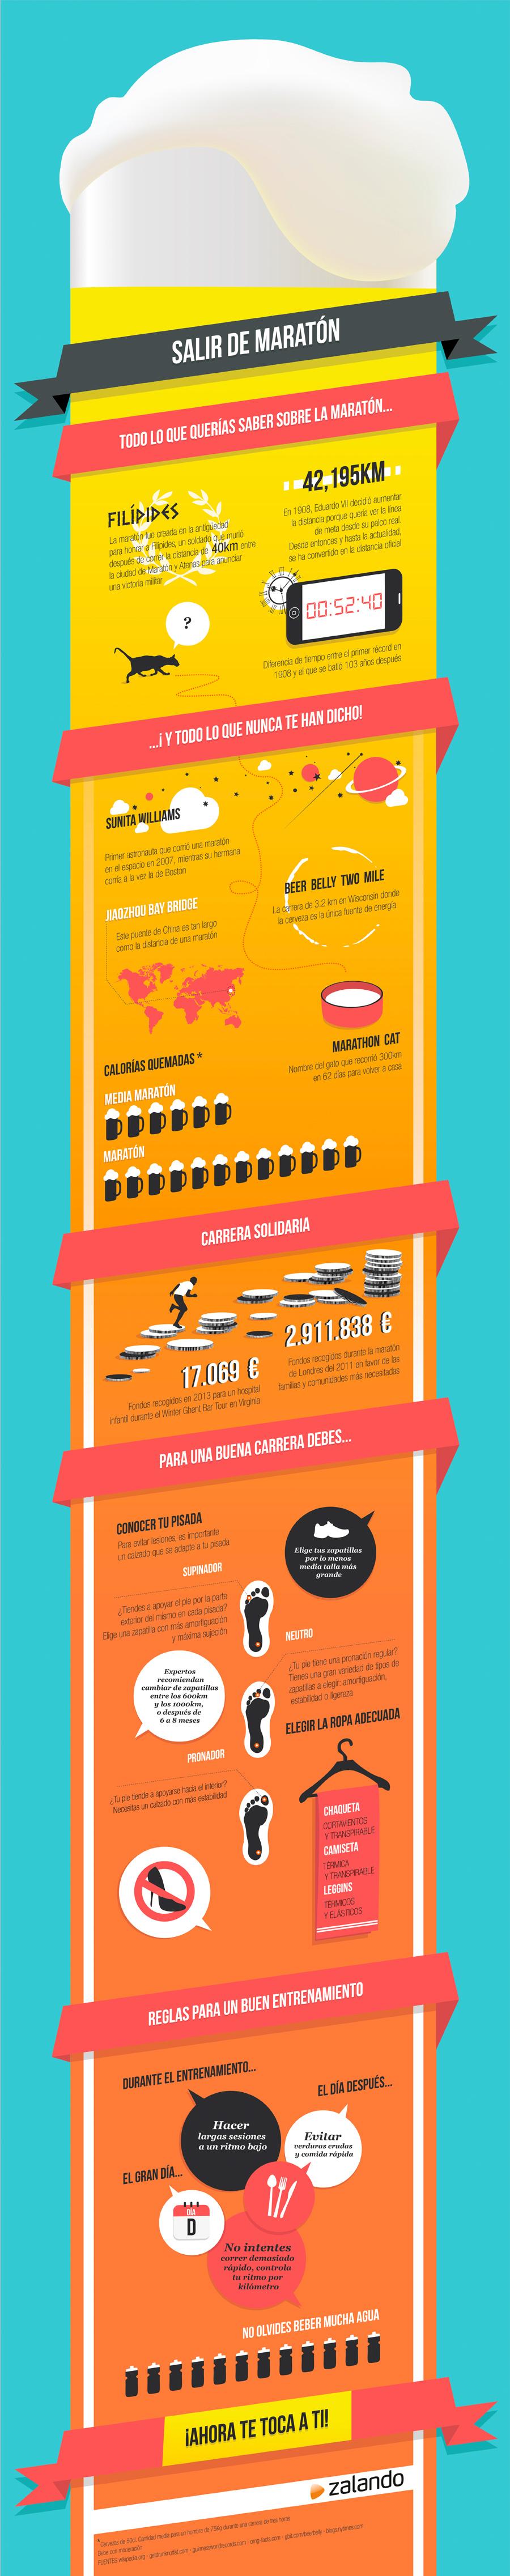 Infografia ZALANDO